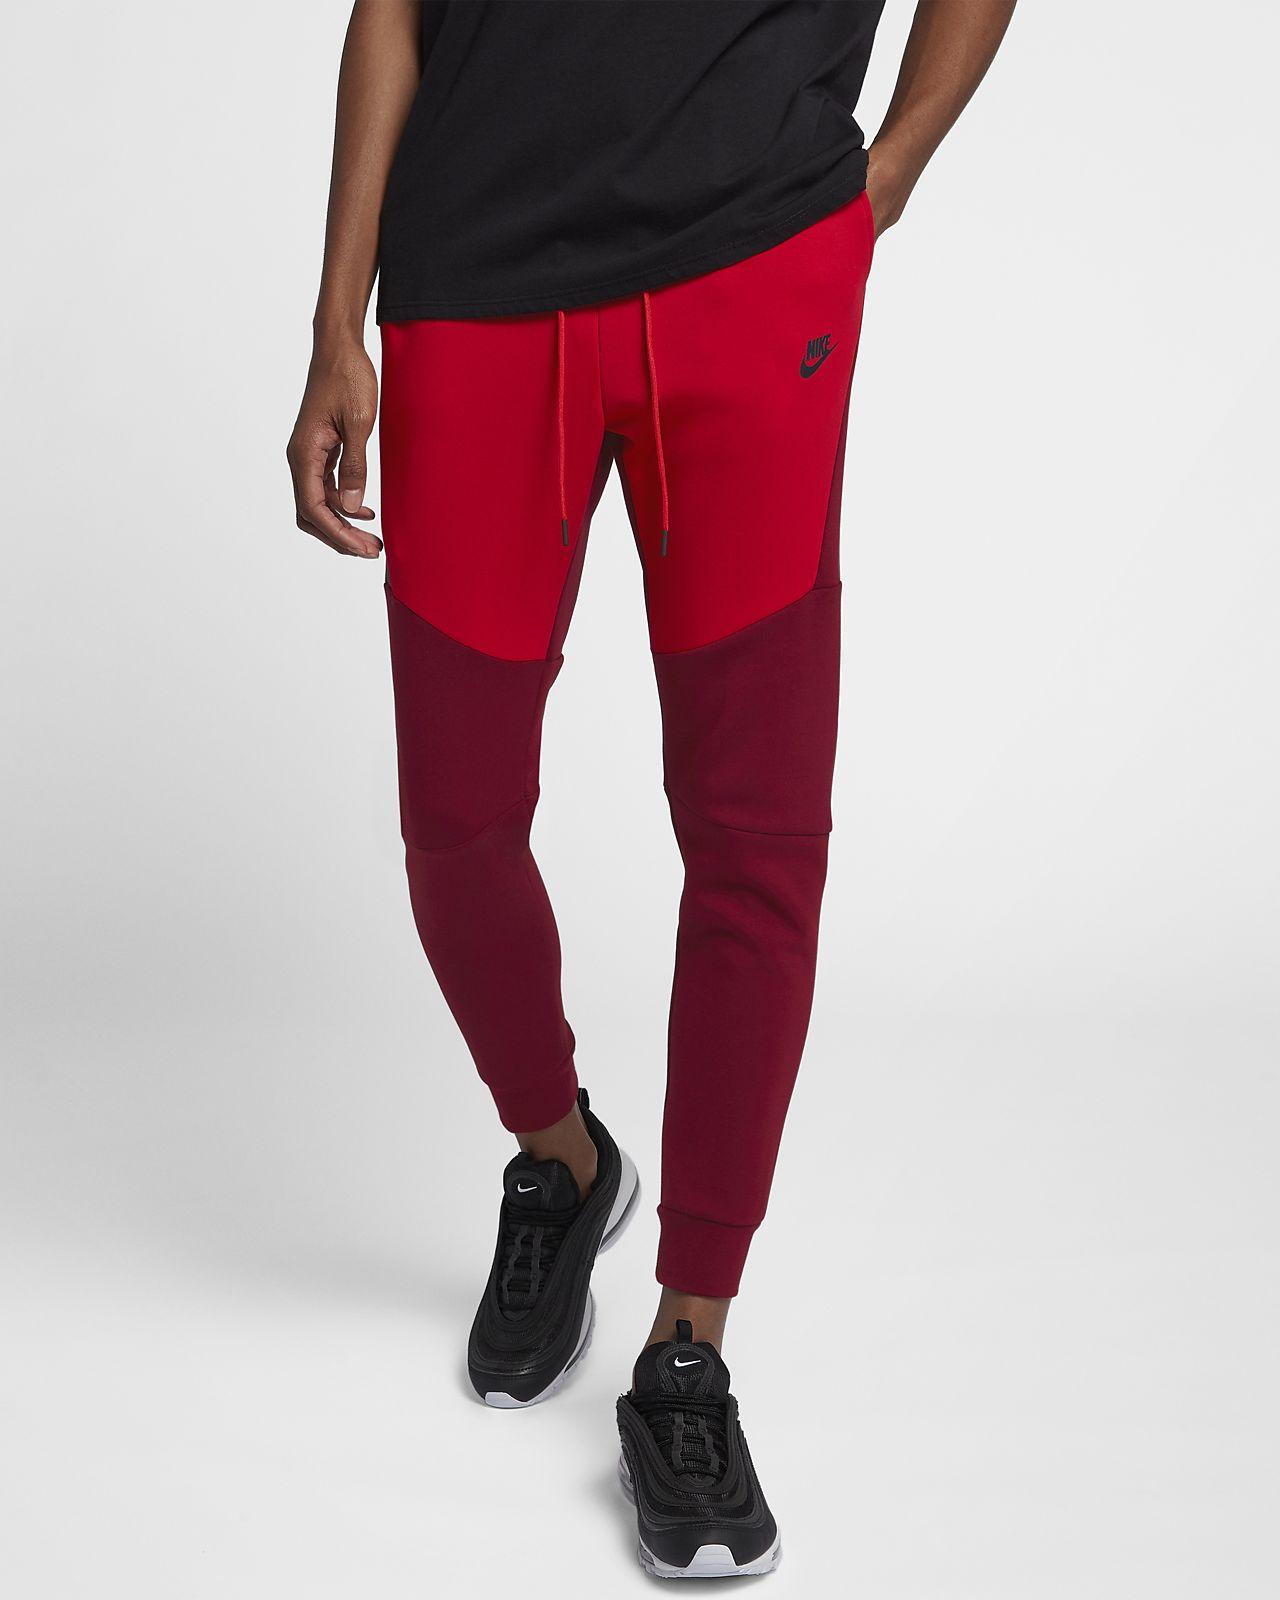 baaf6b1829 Pantalon de jogging Nike Sportswear Tech Fleece pour Homme. Nike.com CA